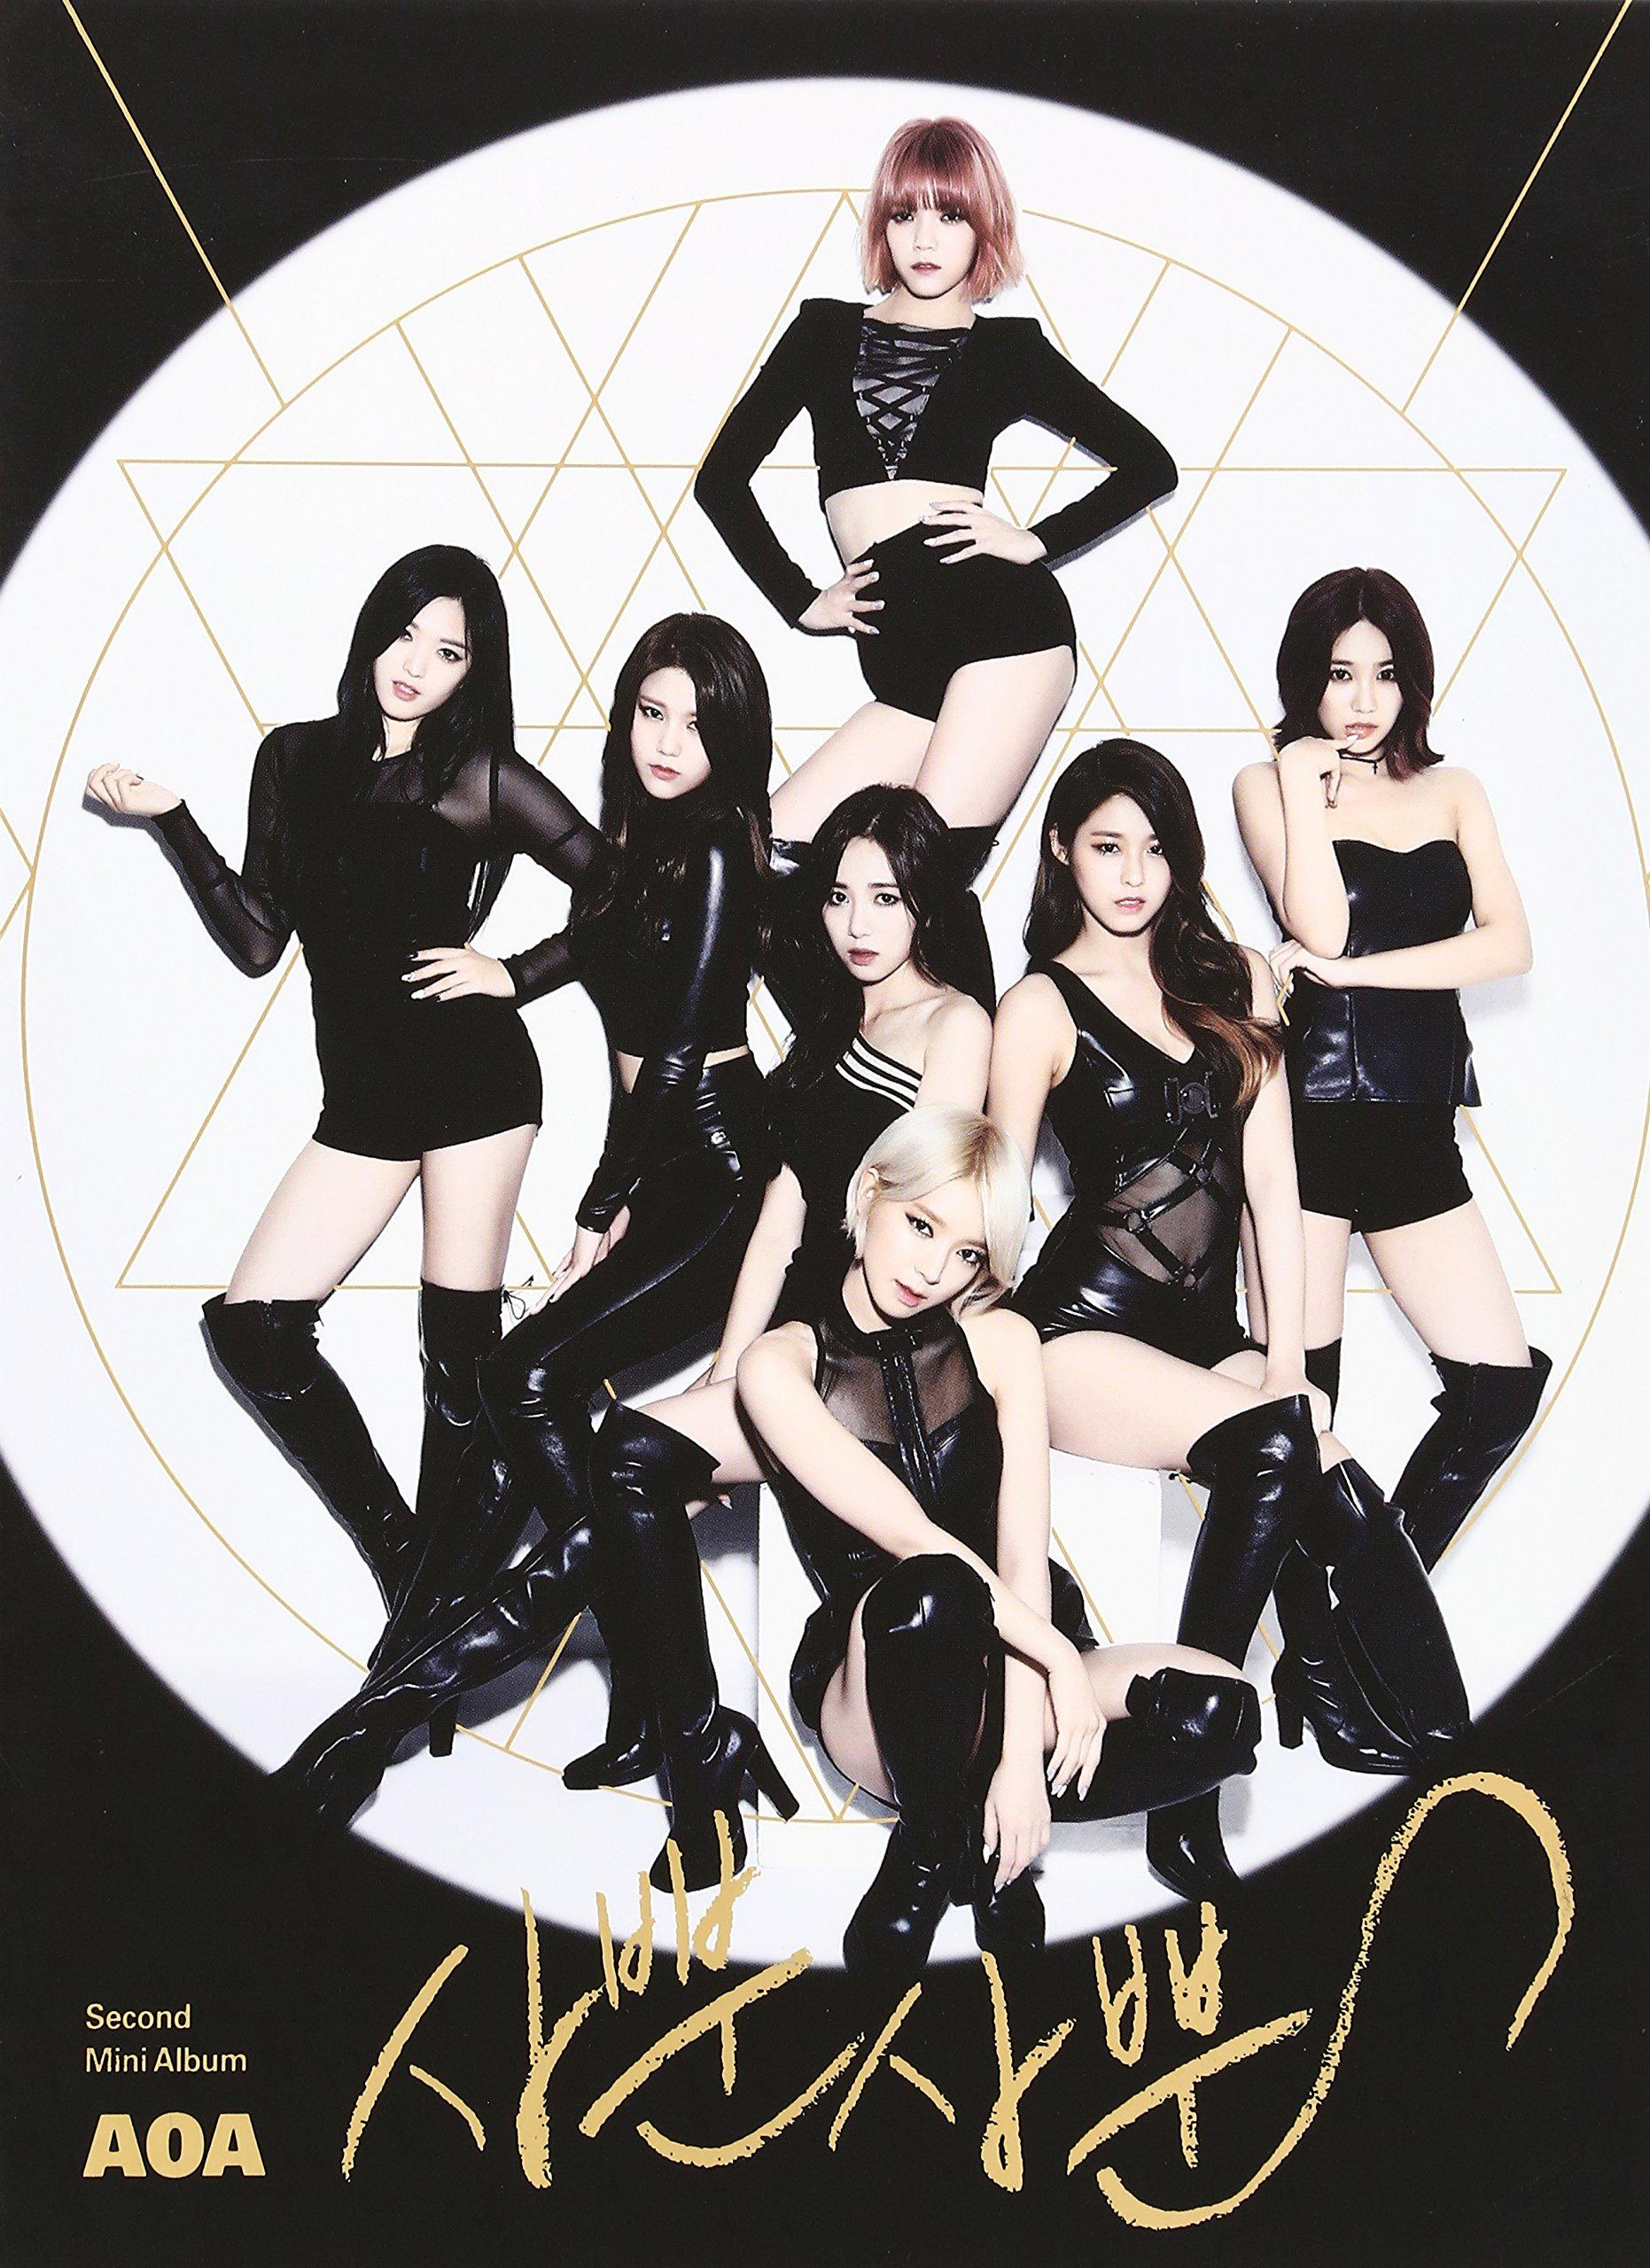 Aoa 2nd Mini Album by Imports